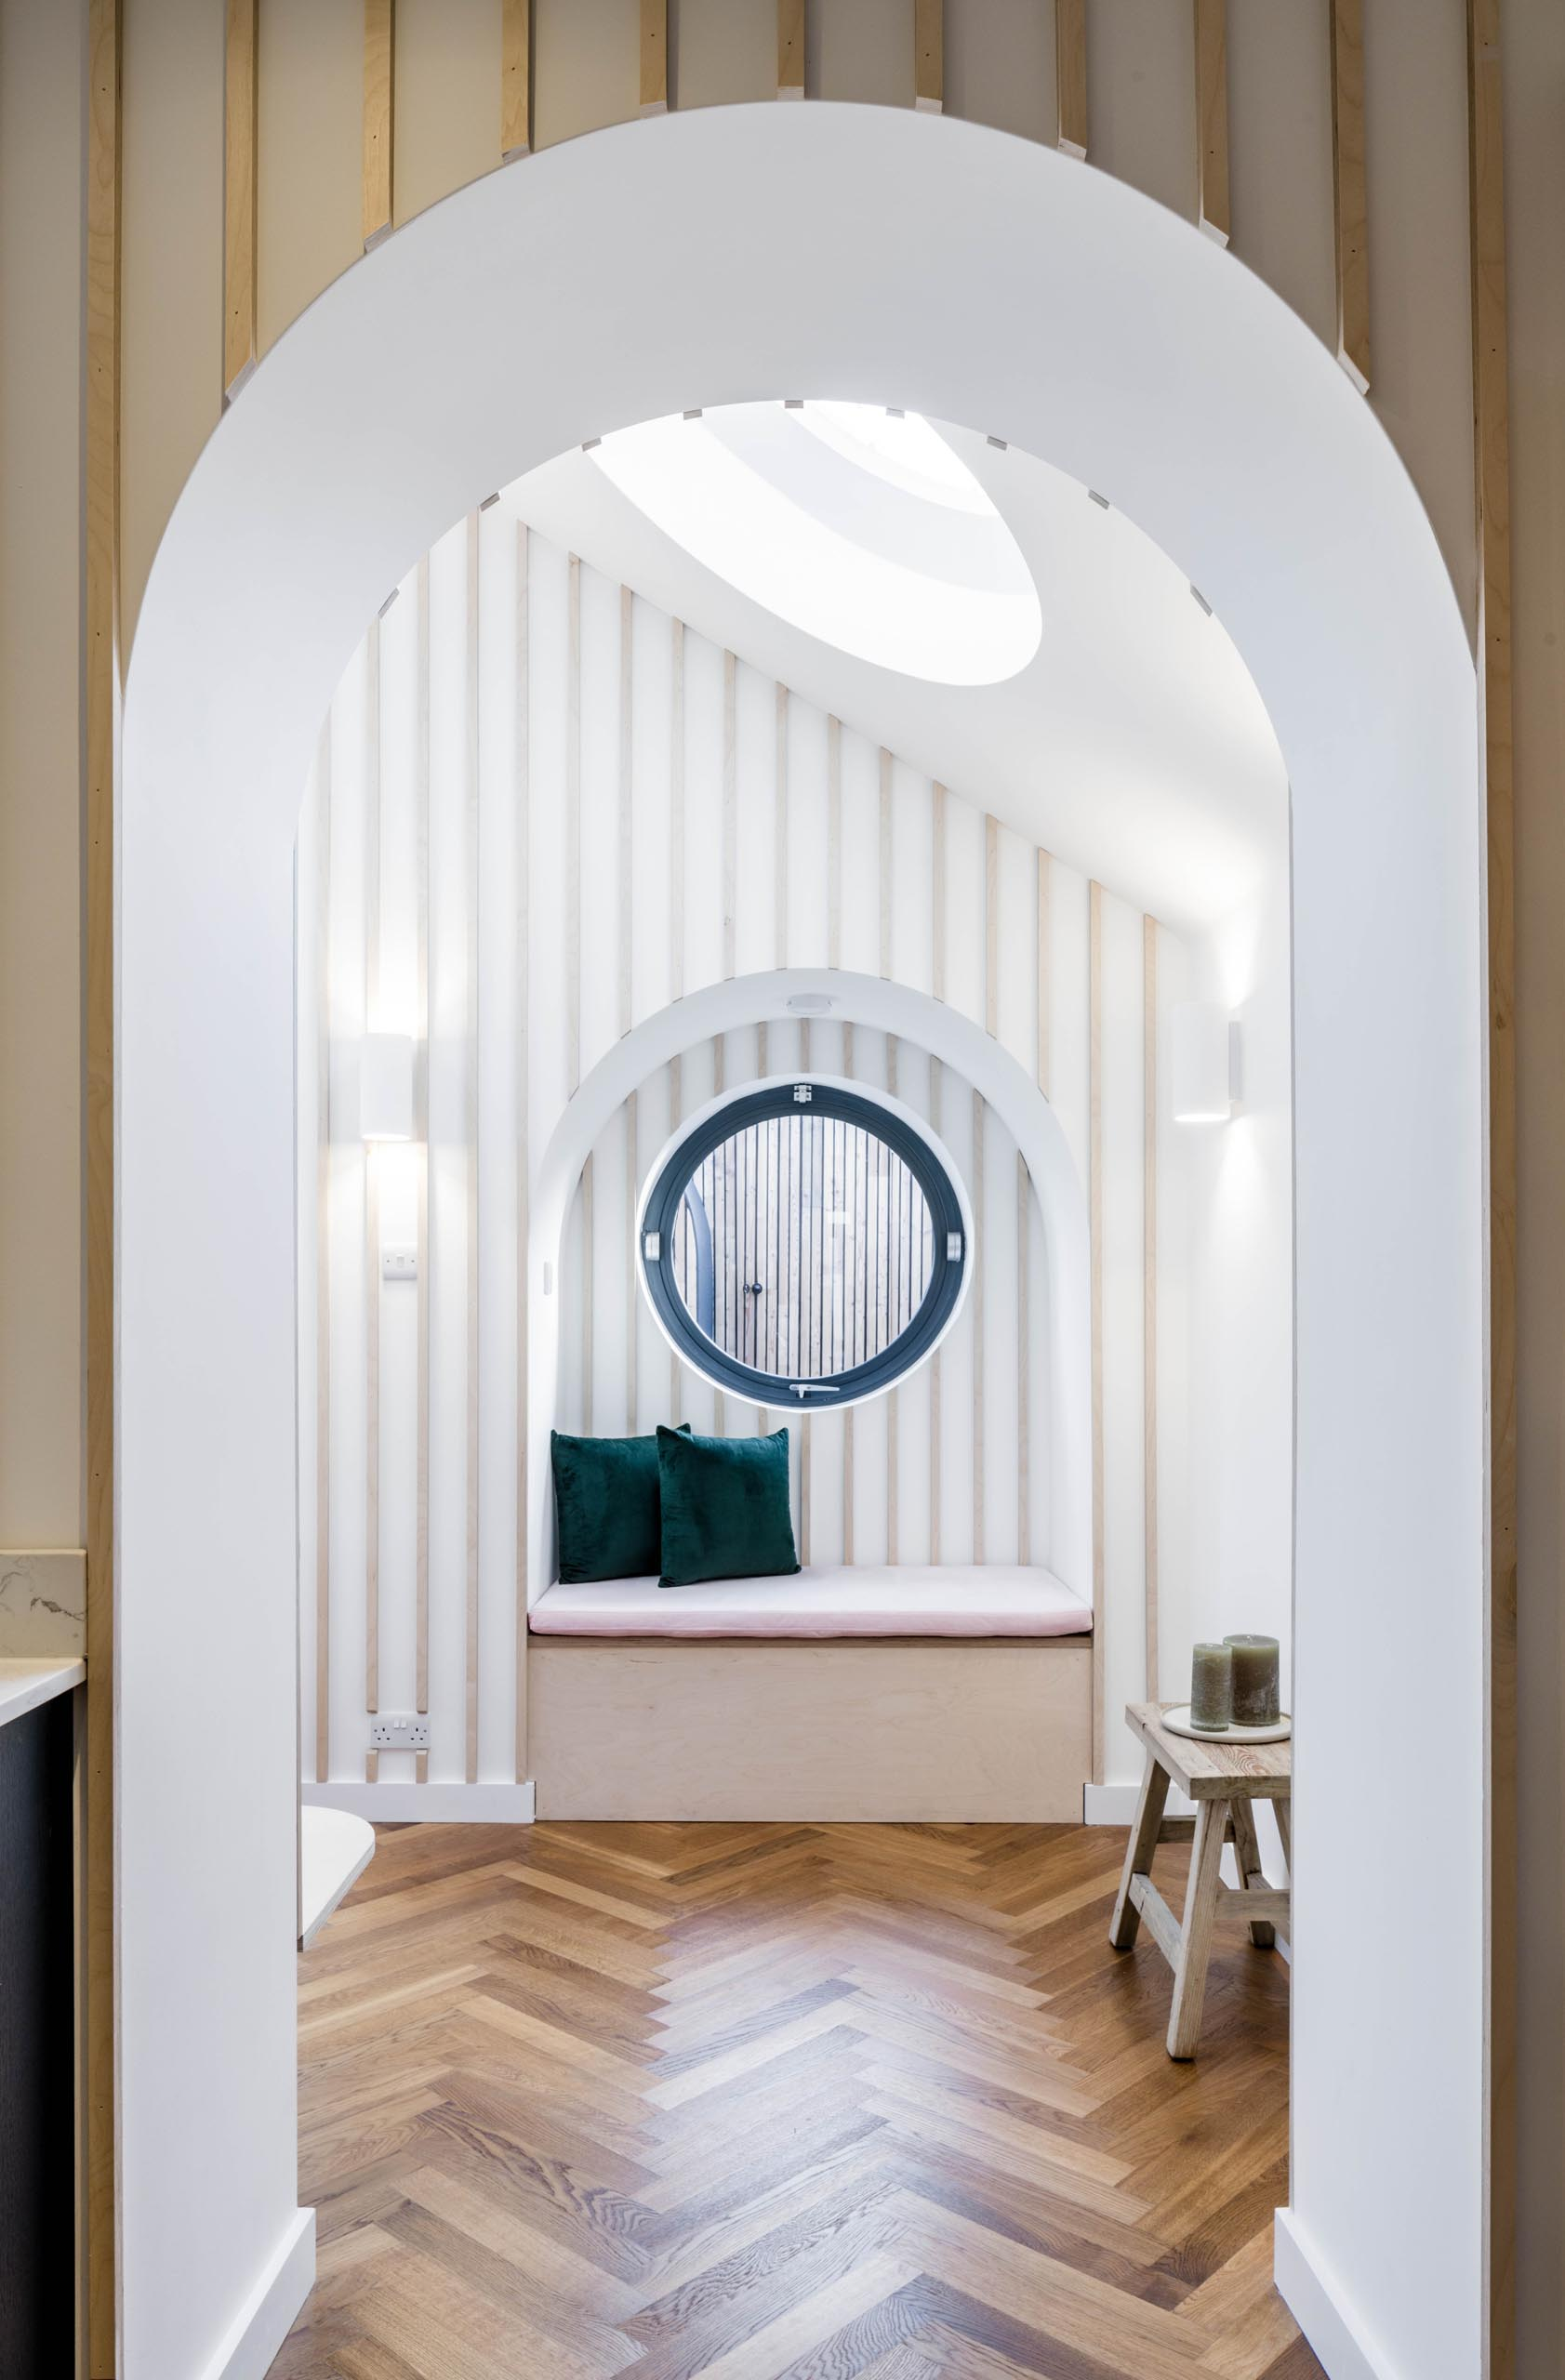 A built-in window bench sits below a round black-framed window.